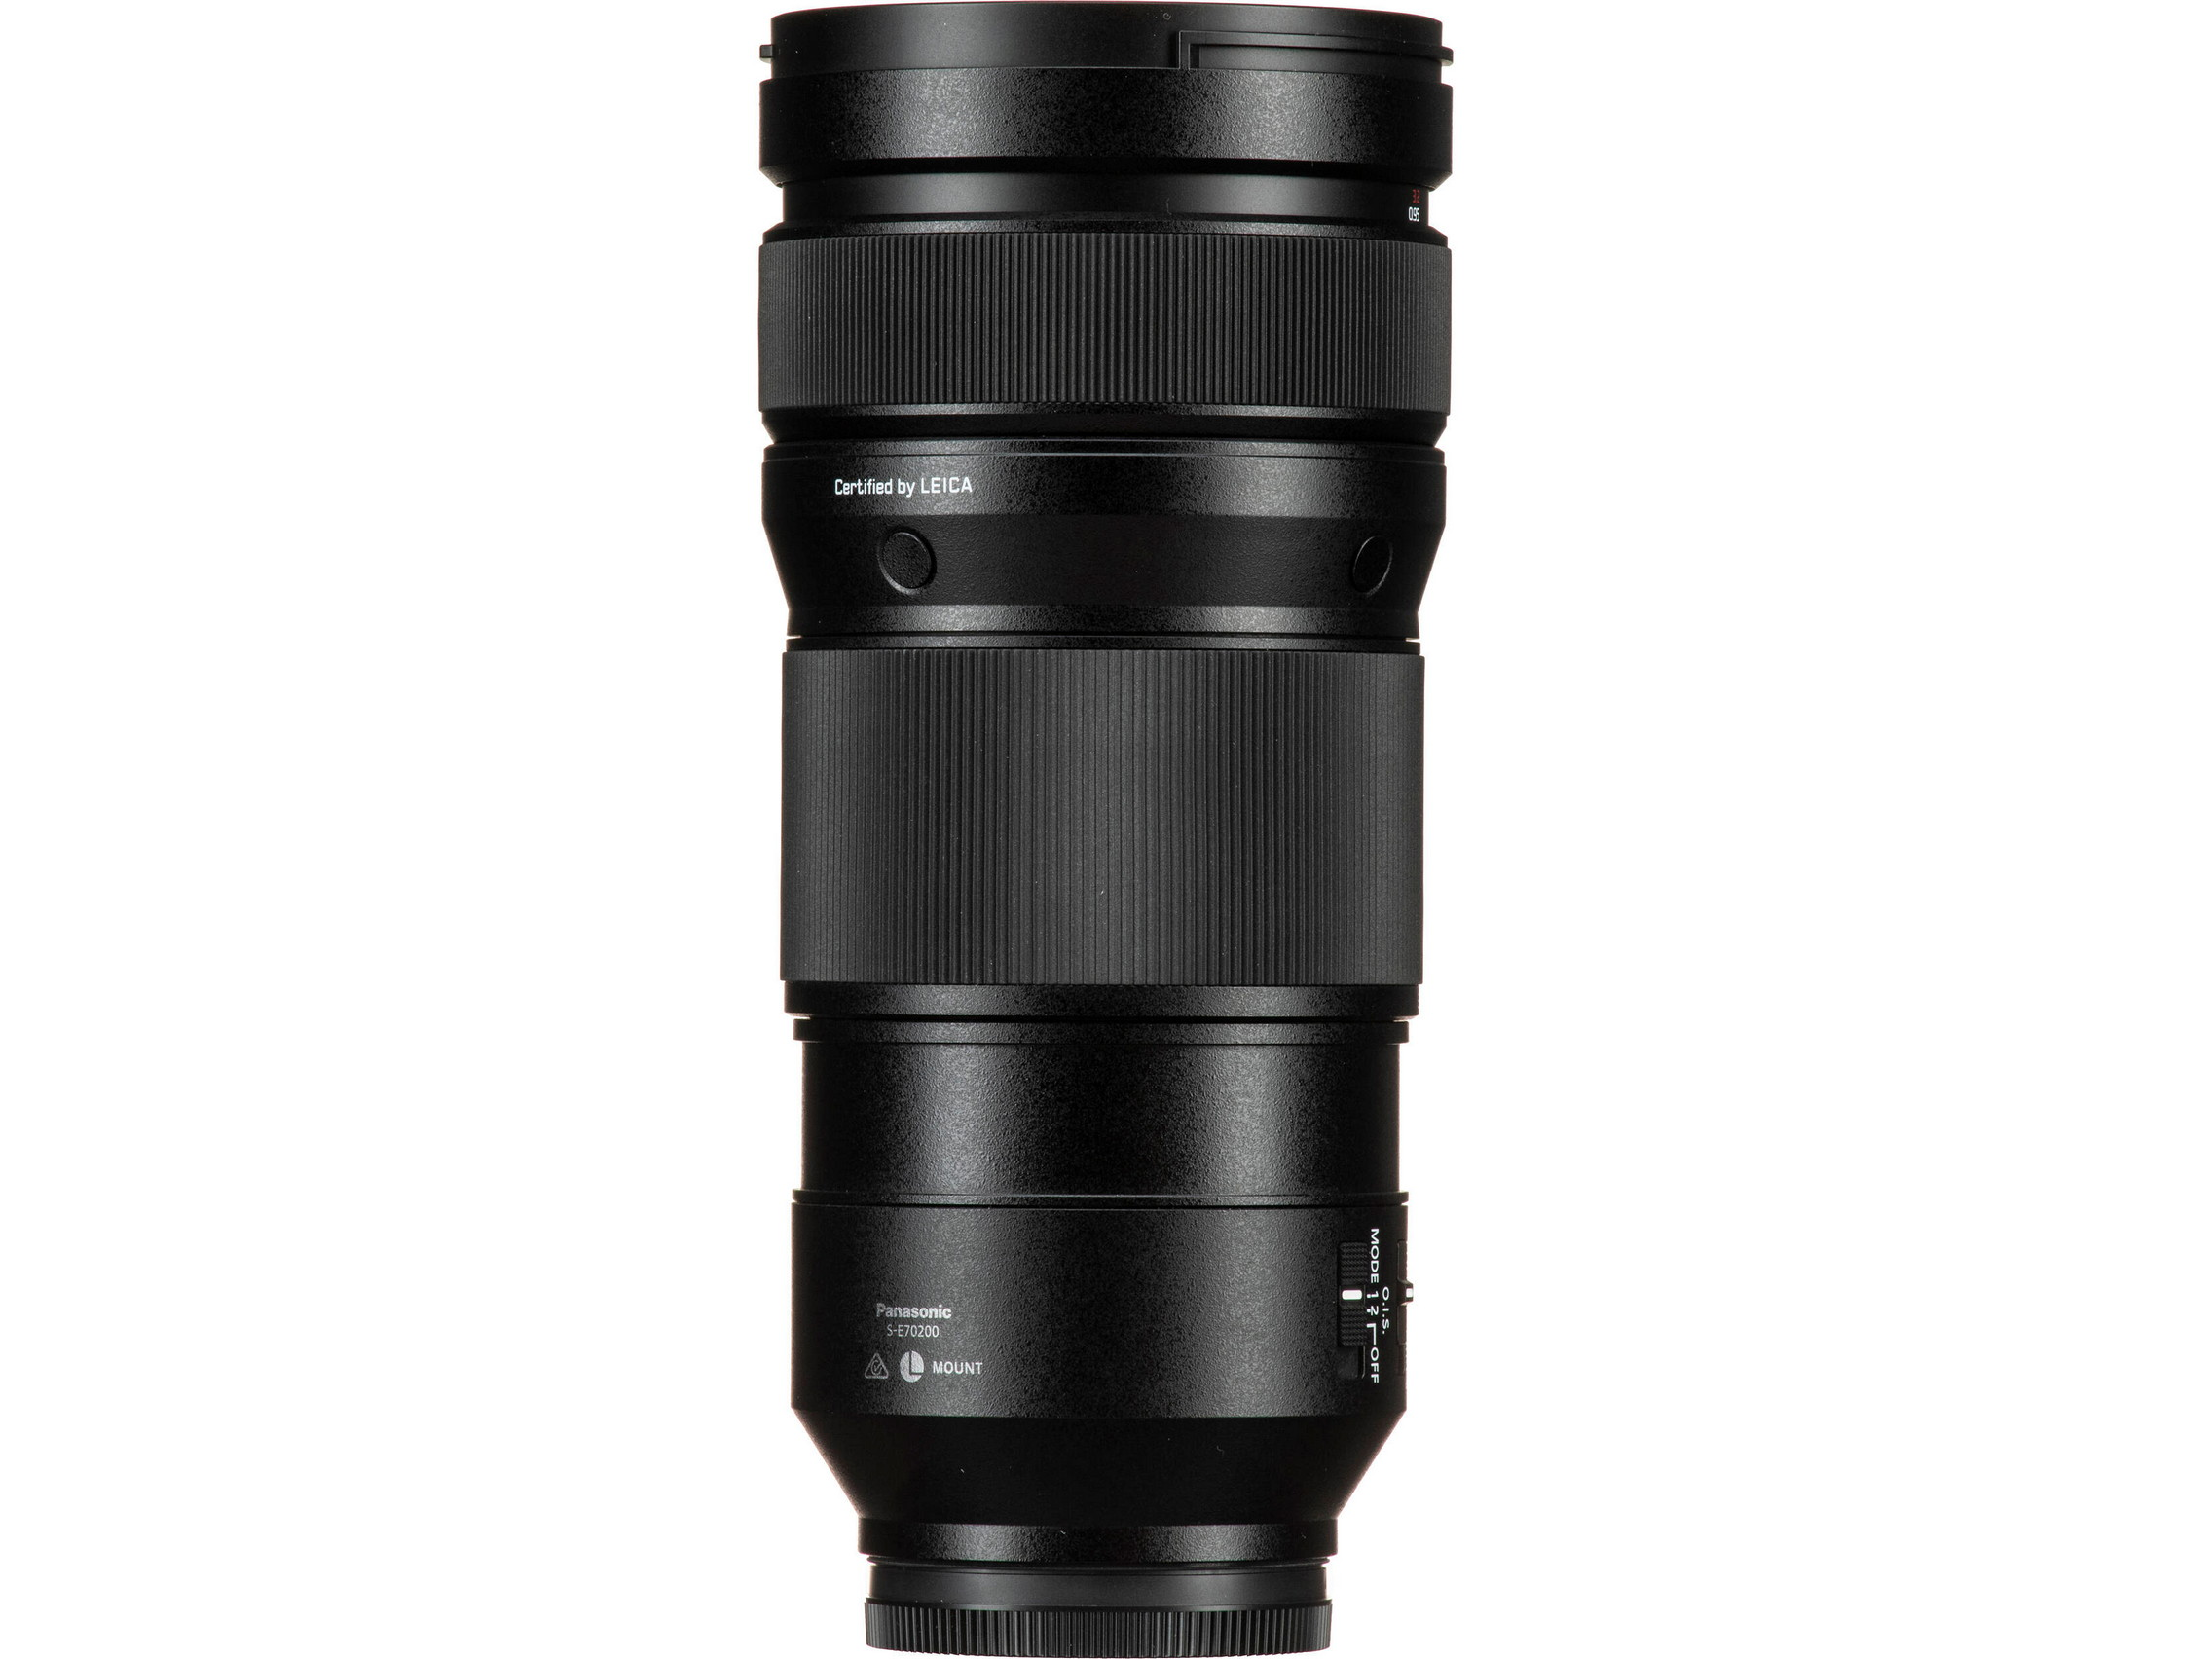 Panasonic LUMIX S PRO 1:2.8/70-200mm O.I.S. Certified by LEICA